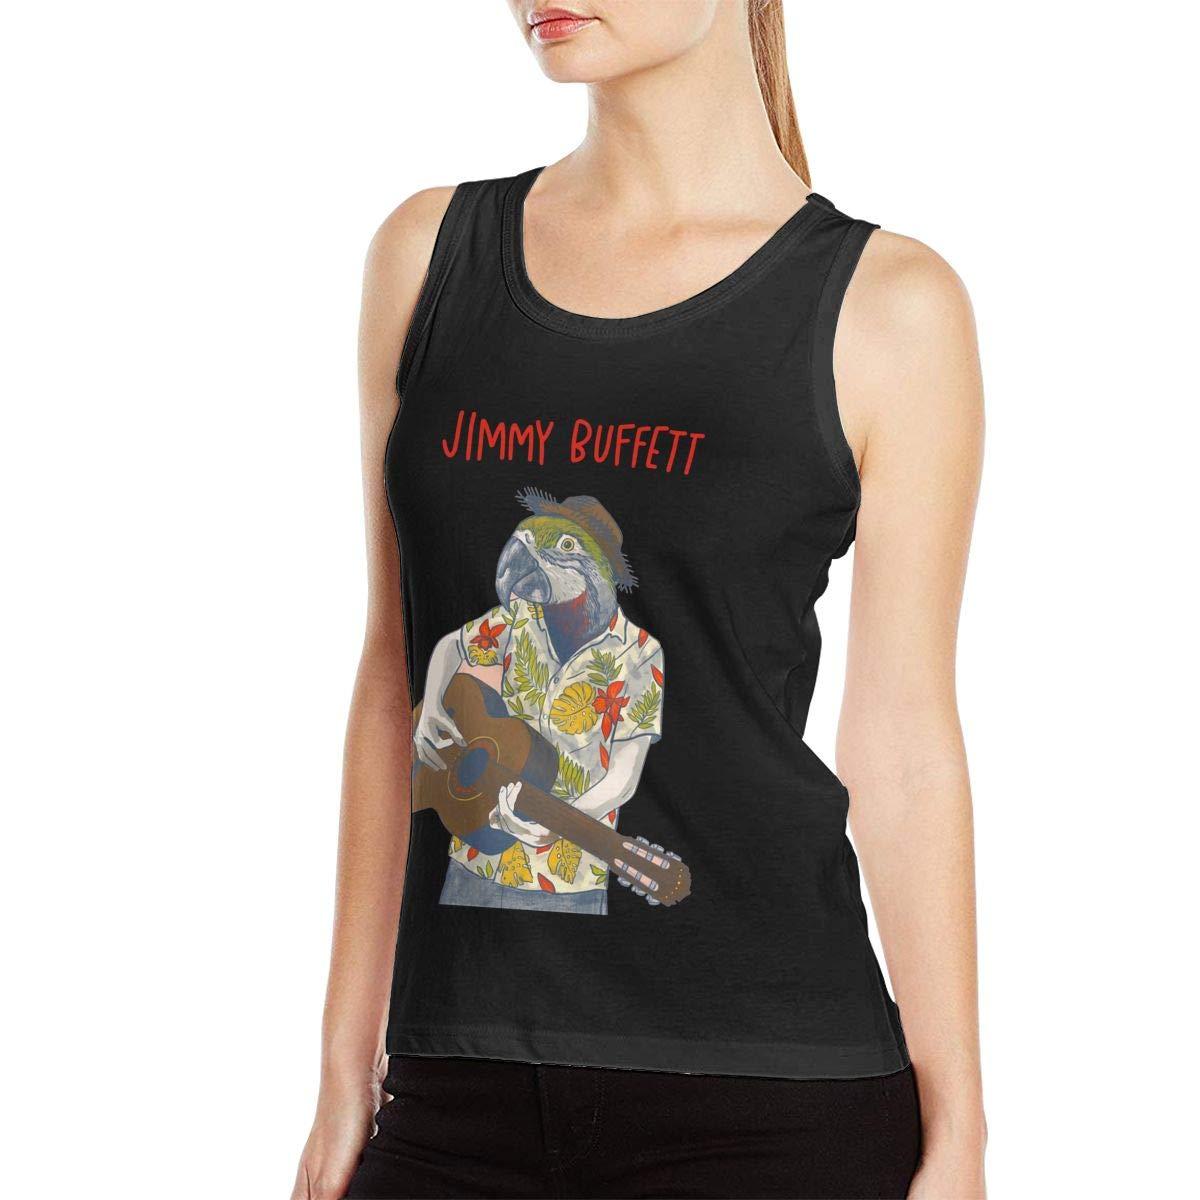 Yoga Tops Activewear Workout Clothes Jimmy Buffett Tank Tops for Women